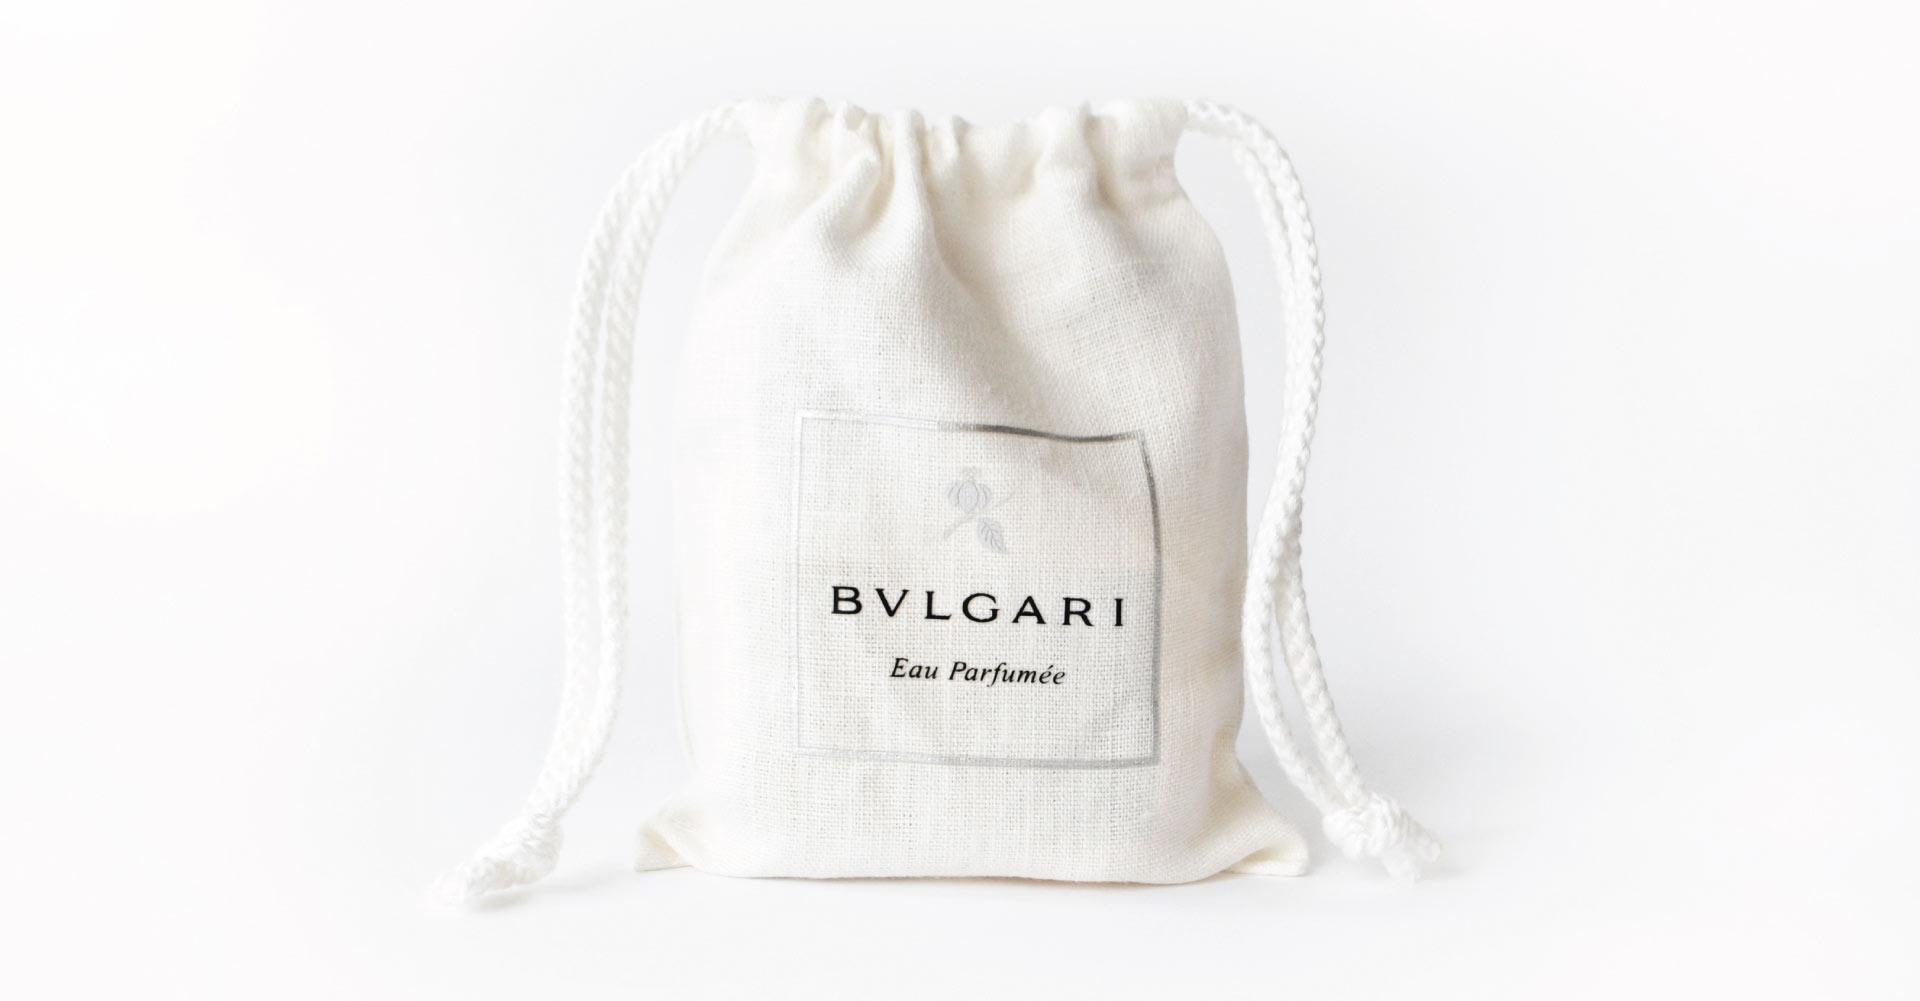 BVLGARI Fragrance Packaging